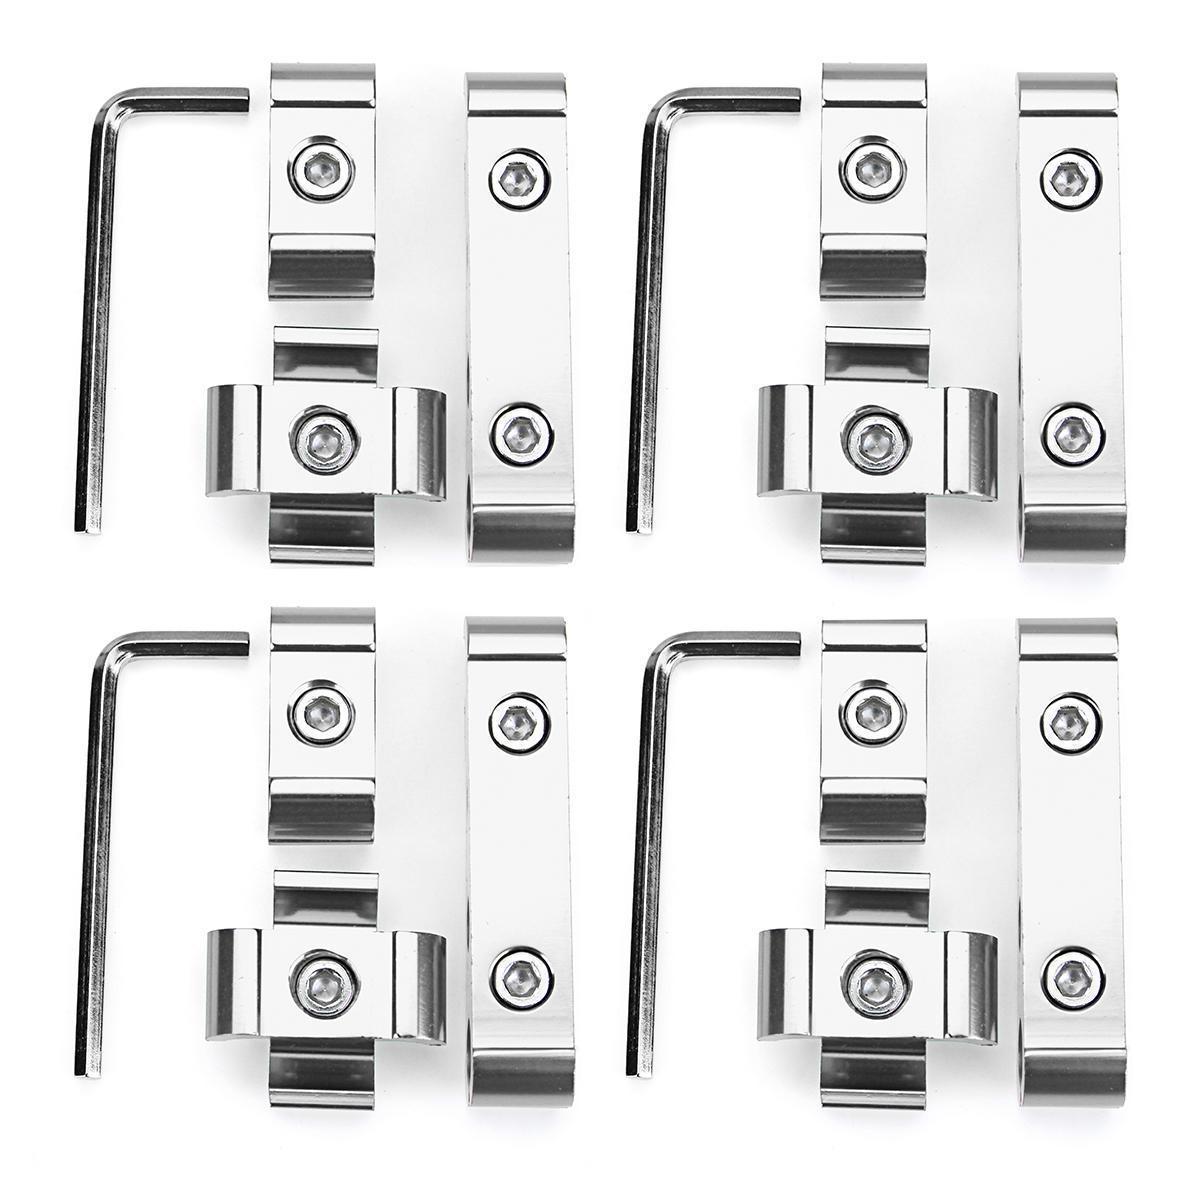 Engine Spark Plug Wires Separator Divider Clamp Kit For 8mm 9mm 10mm Silver